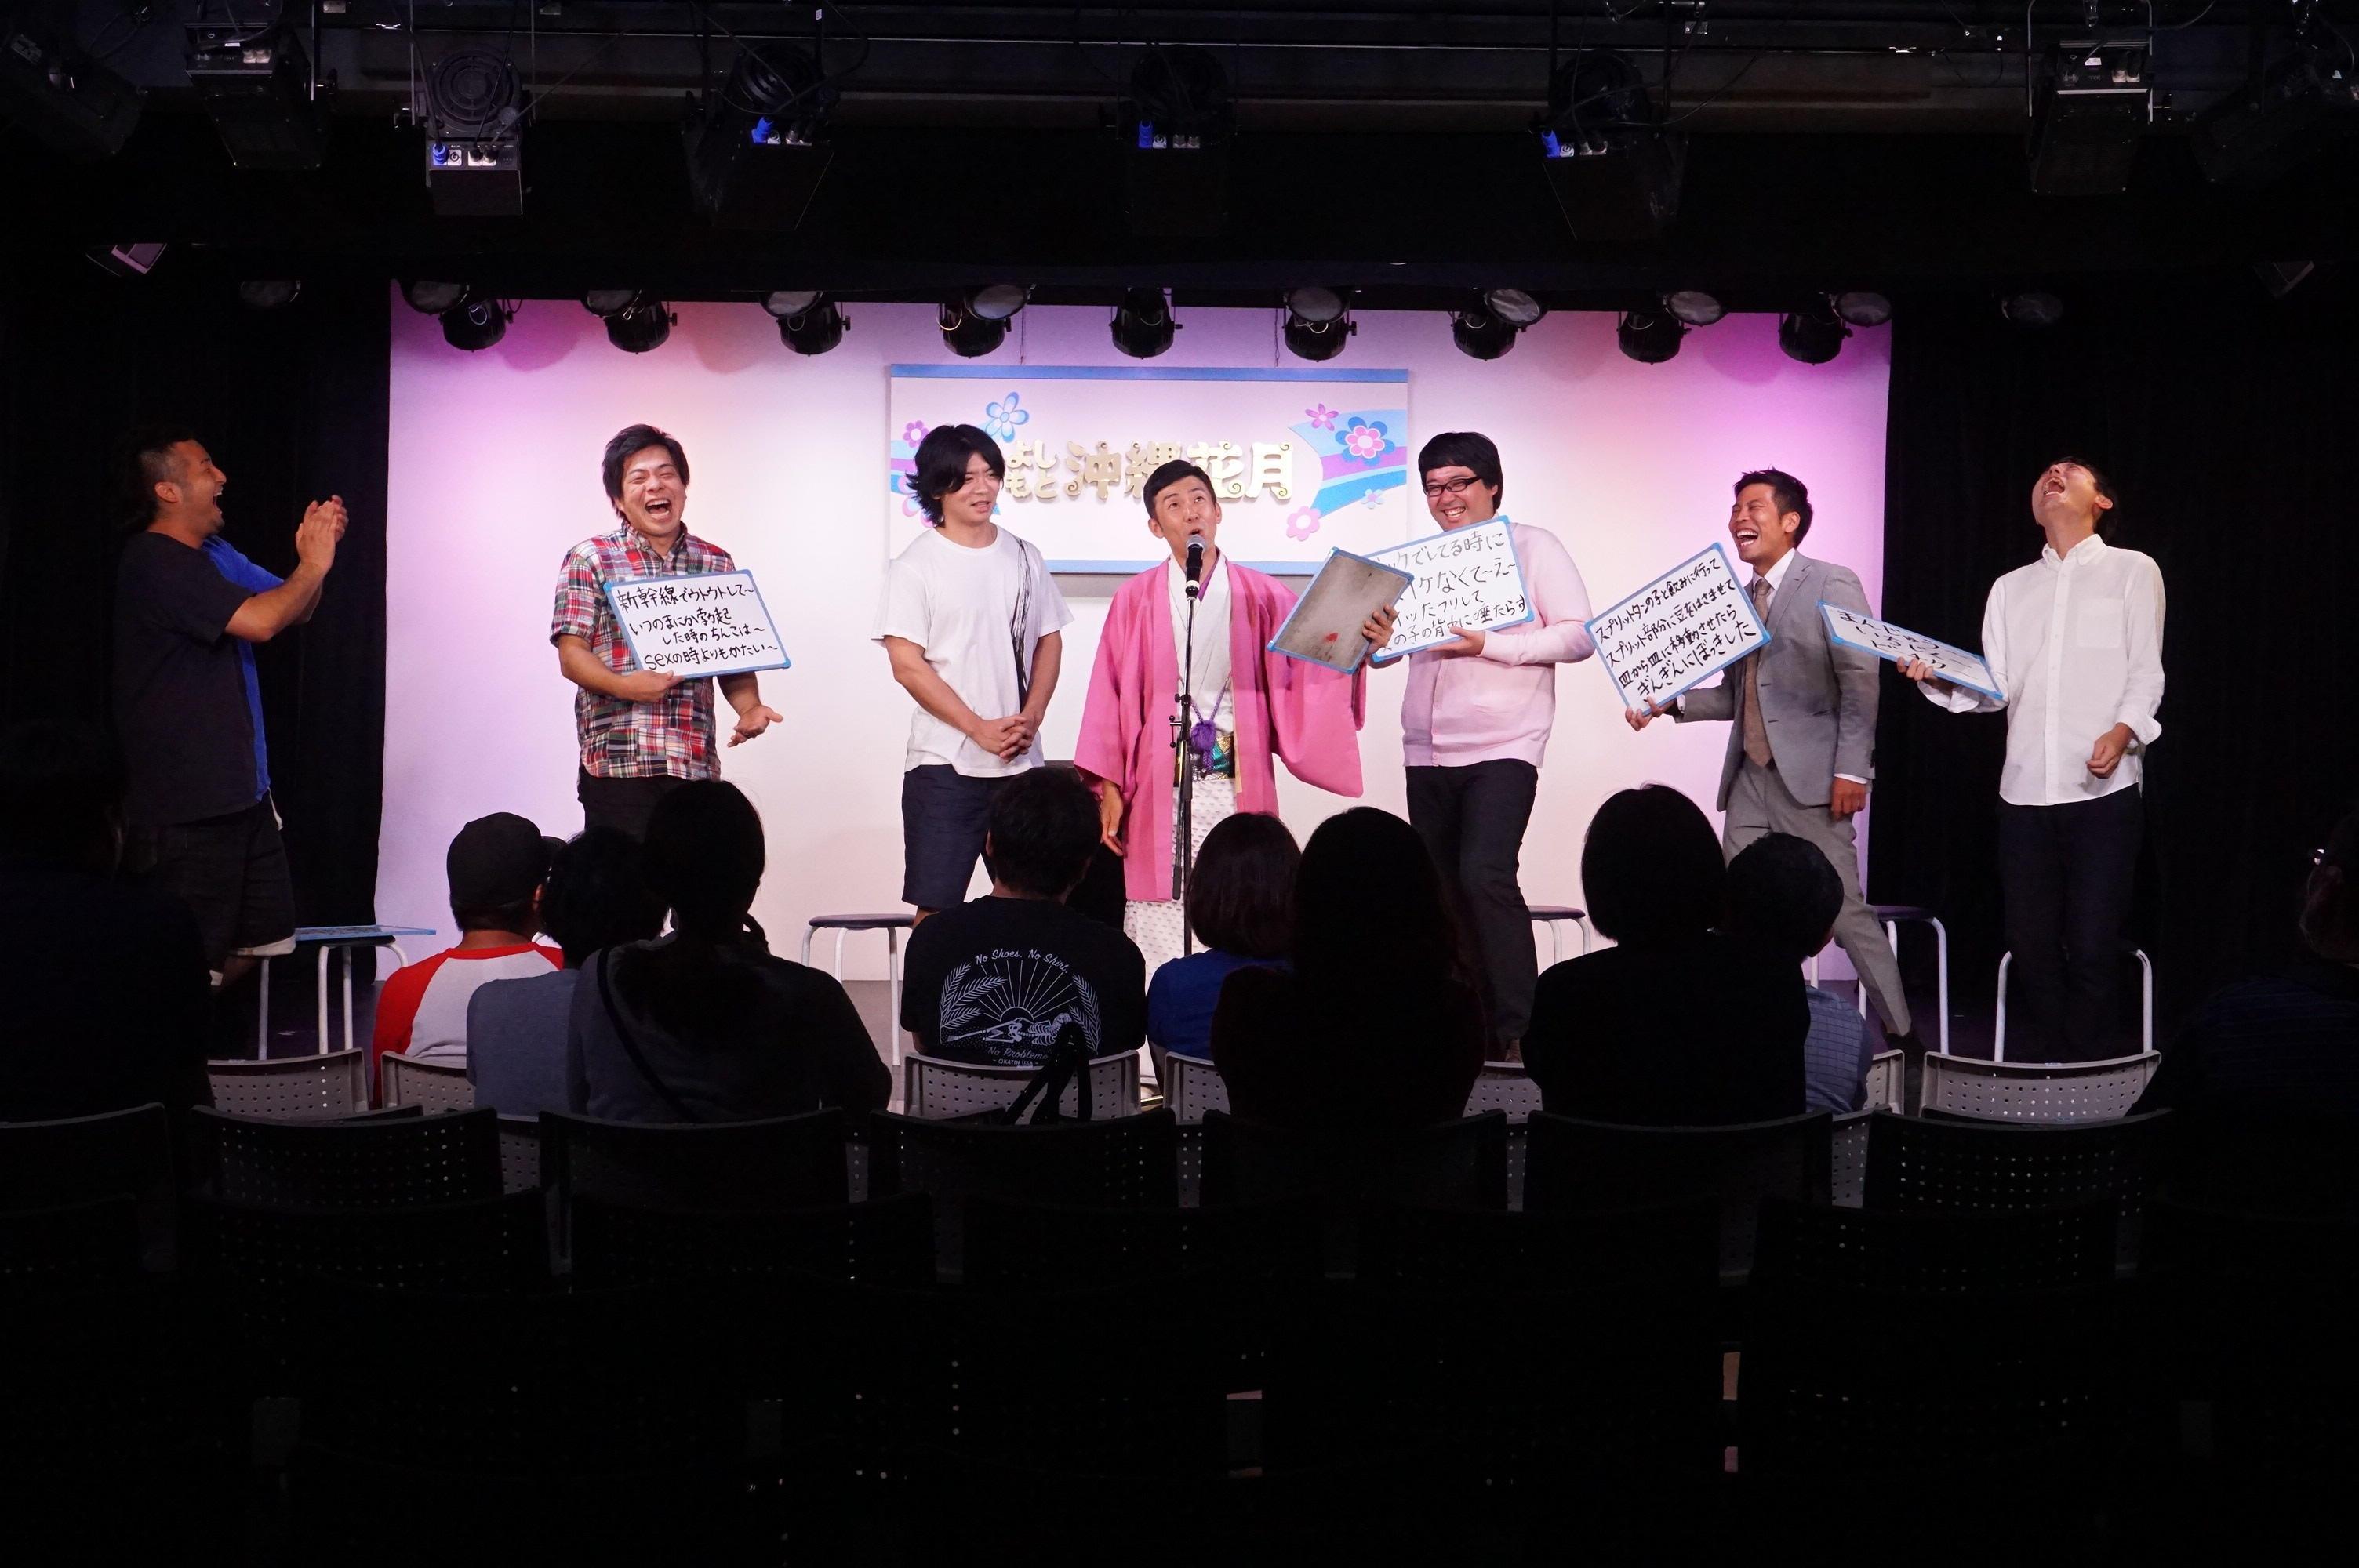 http://news.yoshimoto.co.jp/20180822203923-1ad57fd83604fa8ecfd0dbef5e4cb66c932a5073.jpg